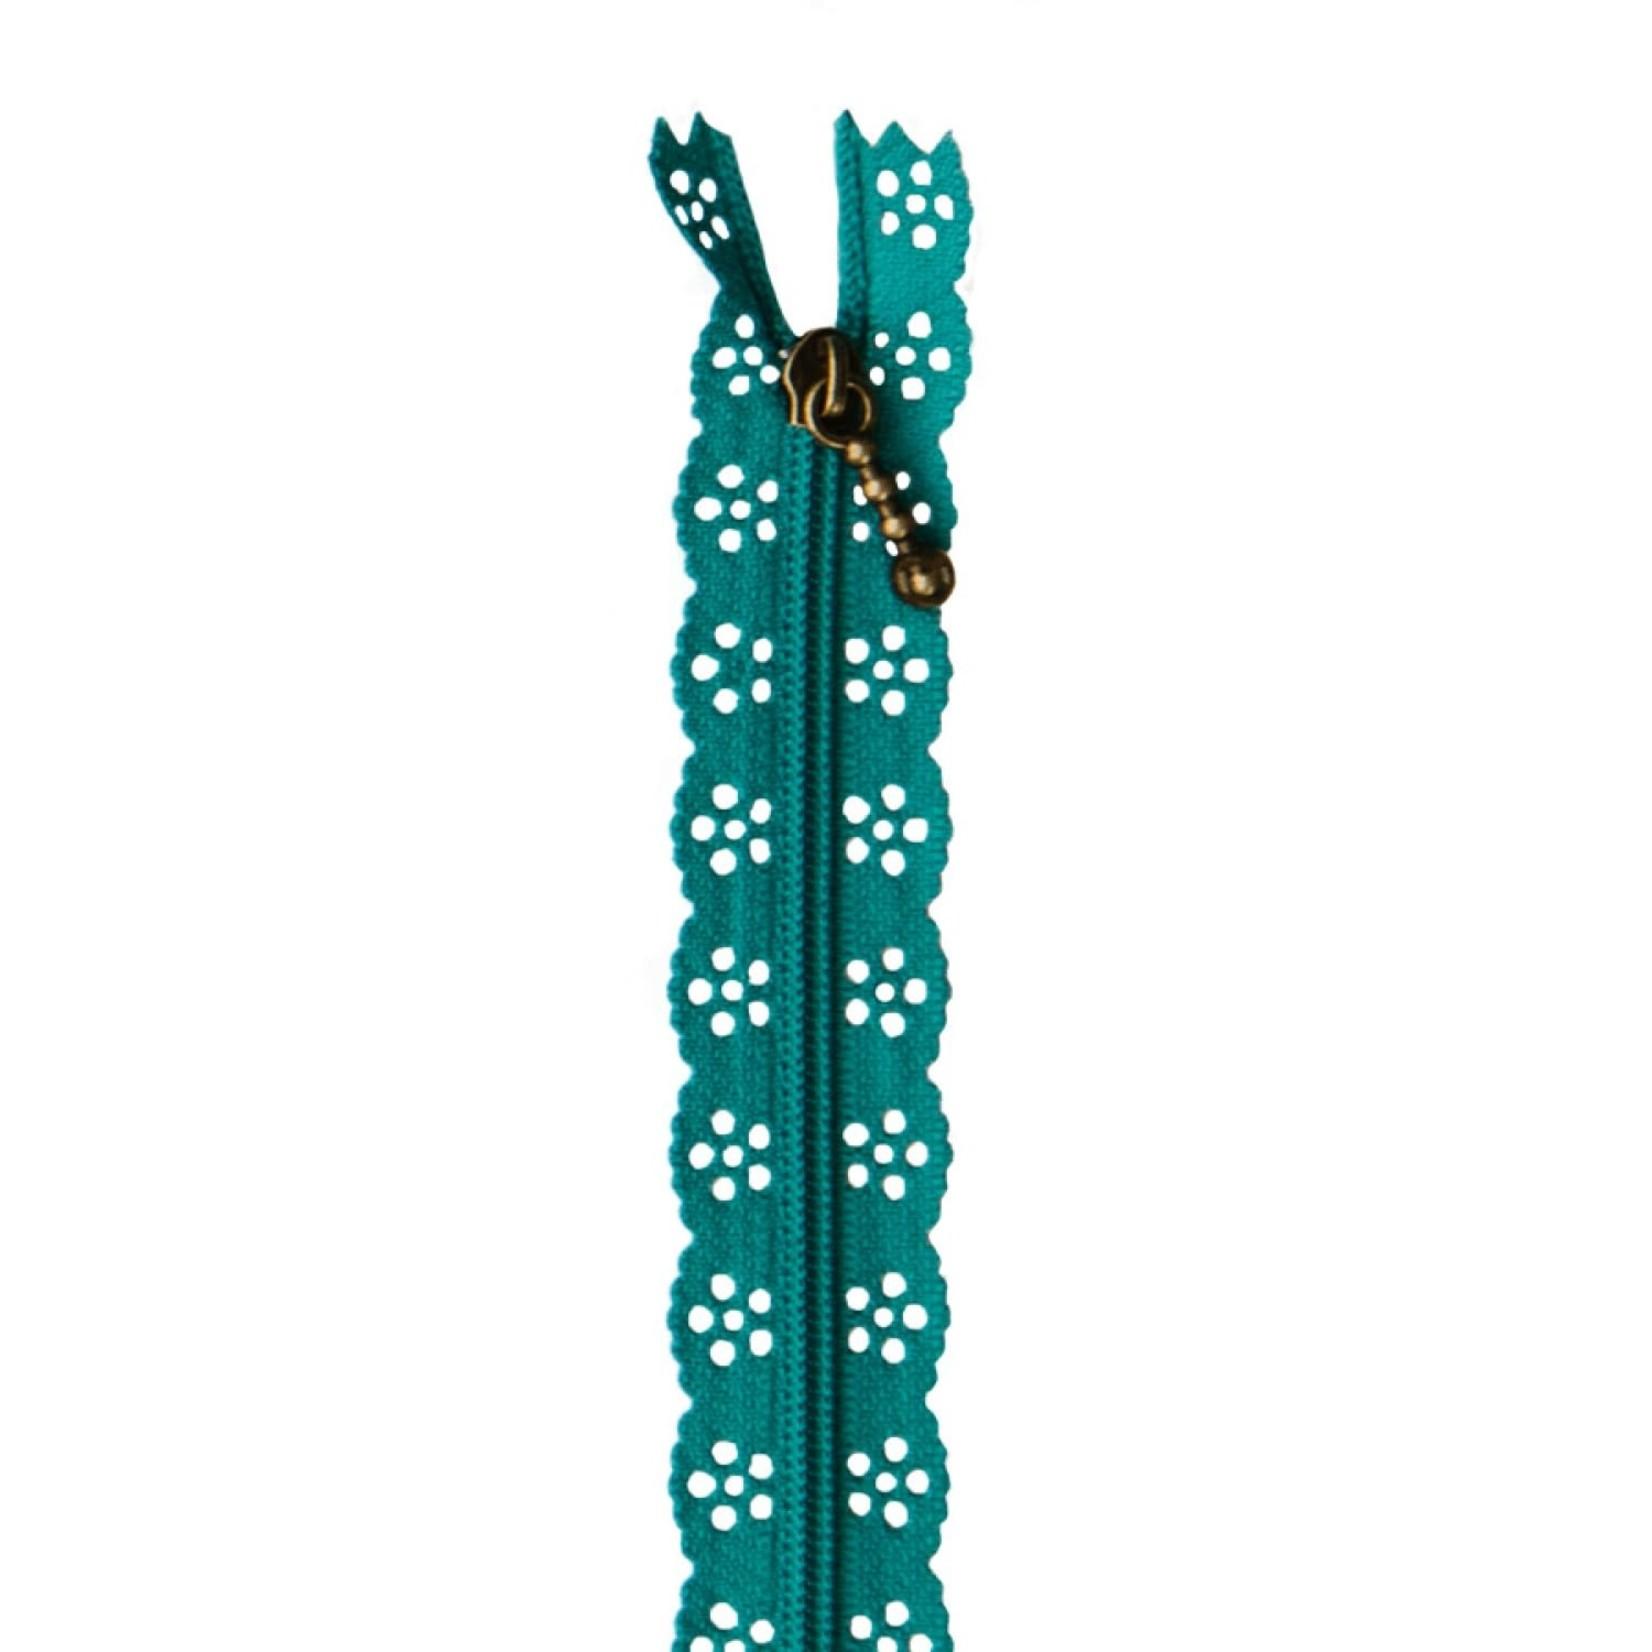 "Kimberbell Designs Lace Zipper 14"" - Deep Sea Blue"